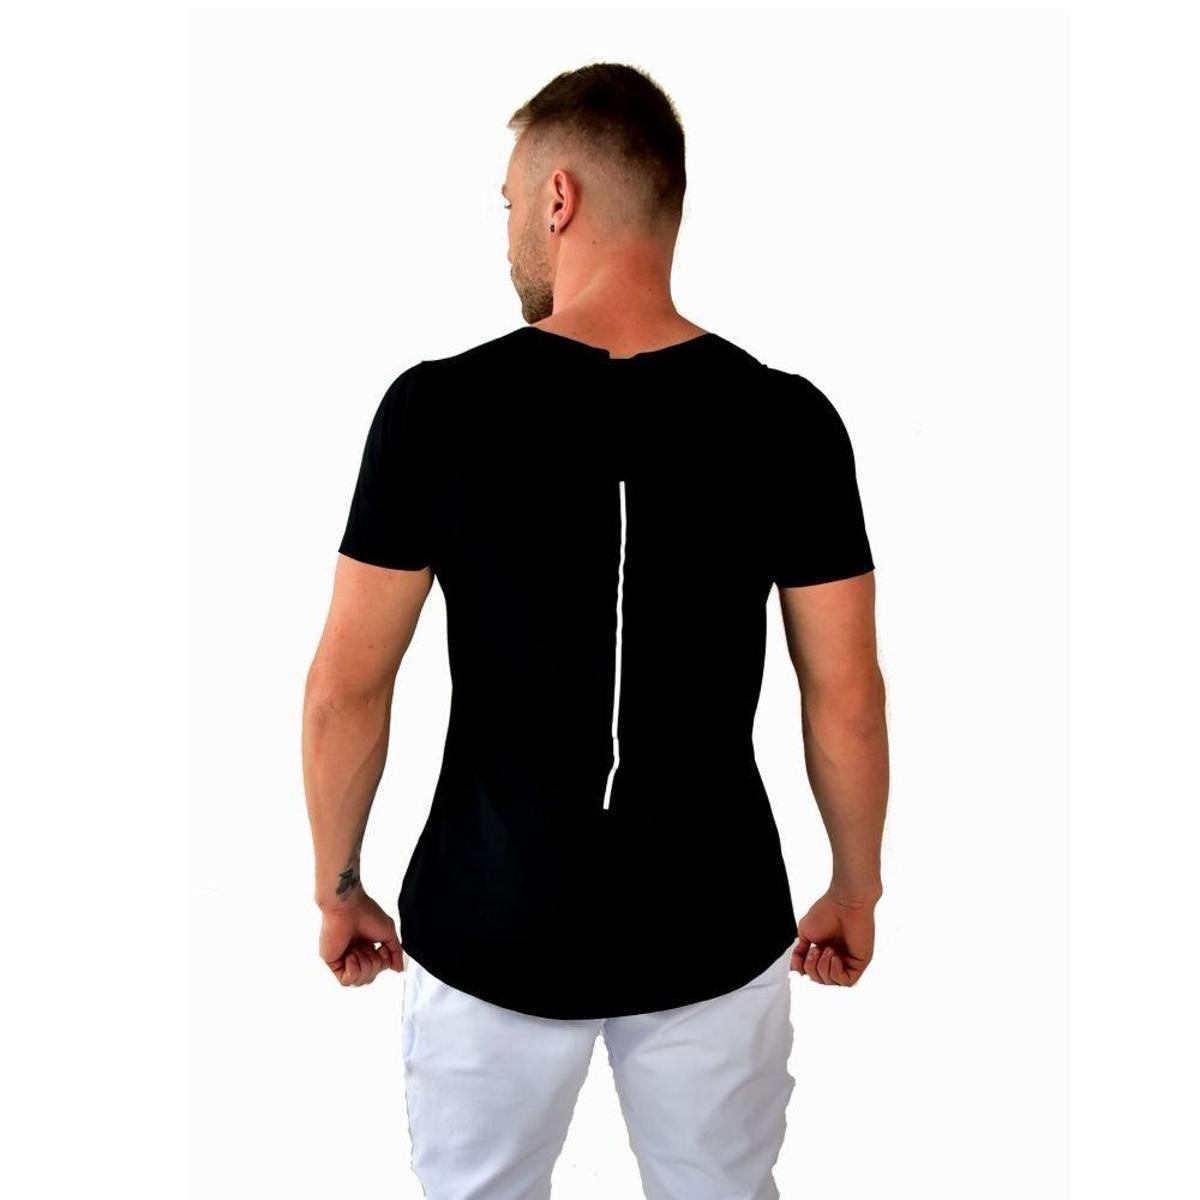 Camiseta Longline Brohood Viscolycra Masculino - Preto